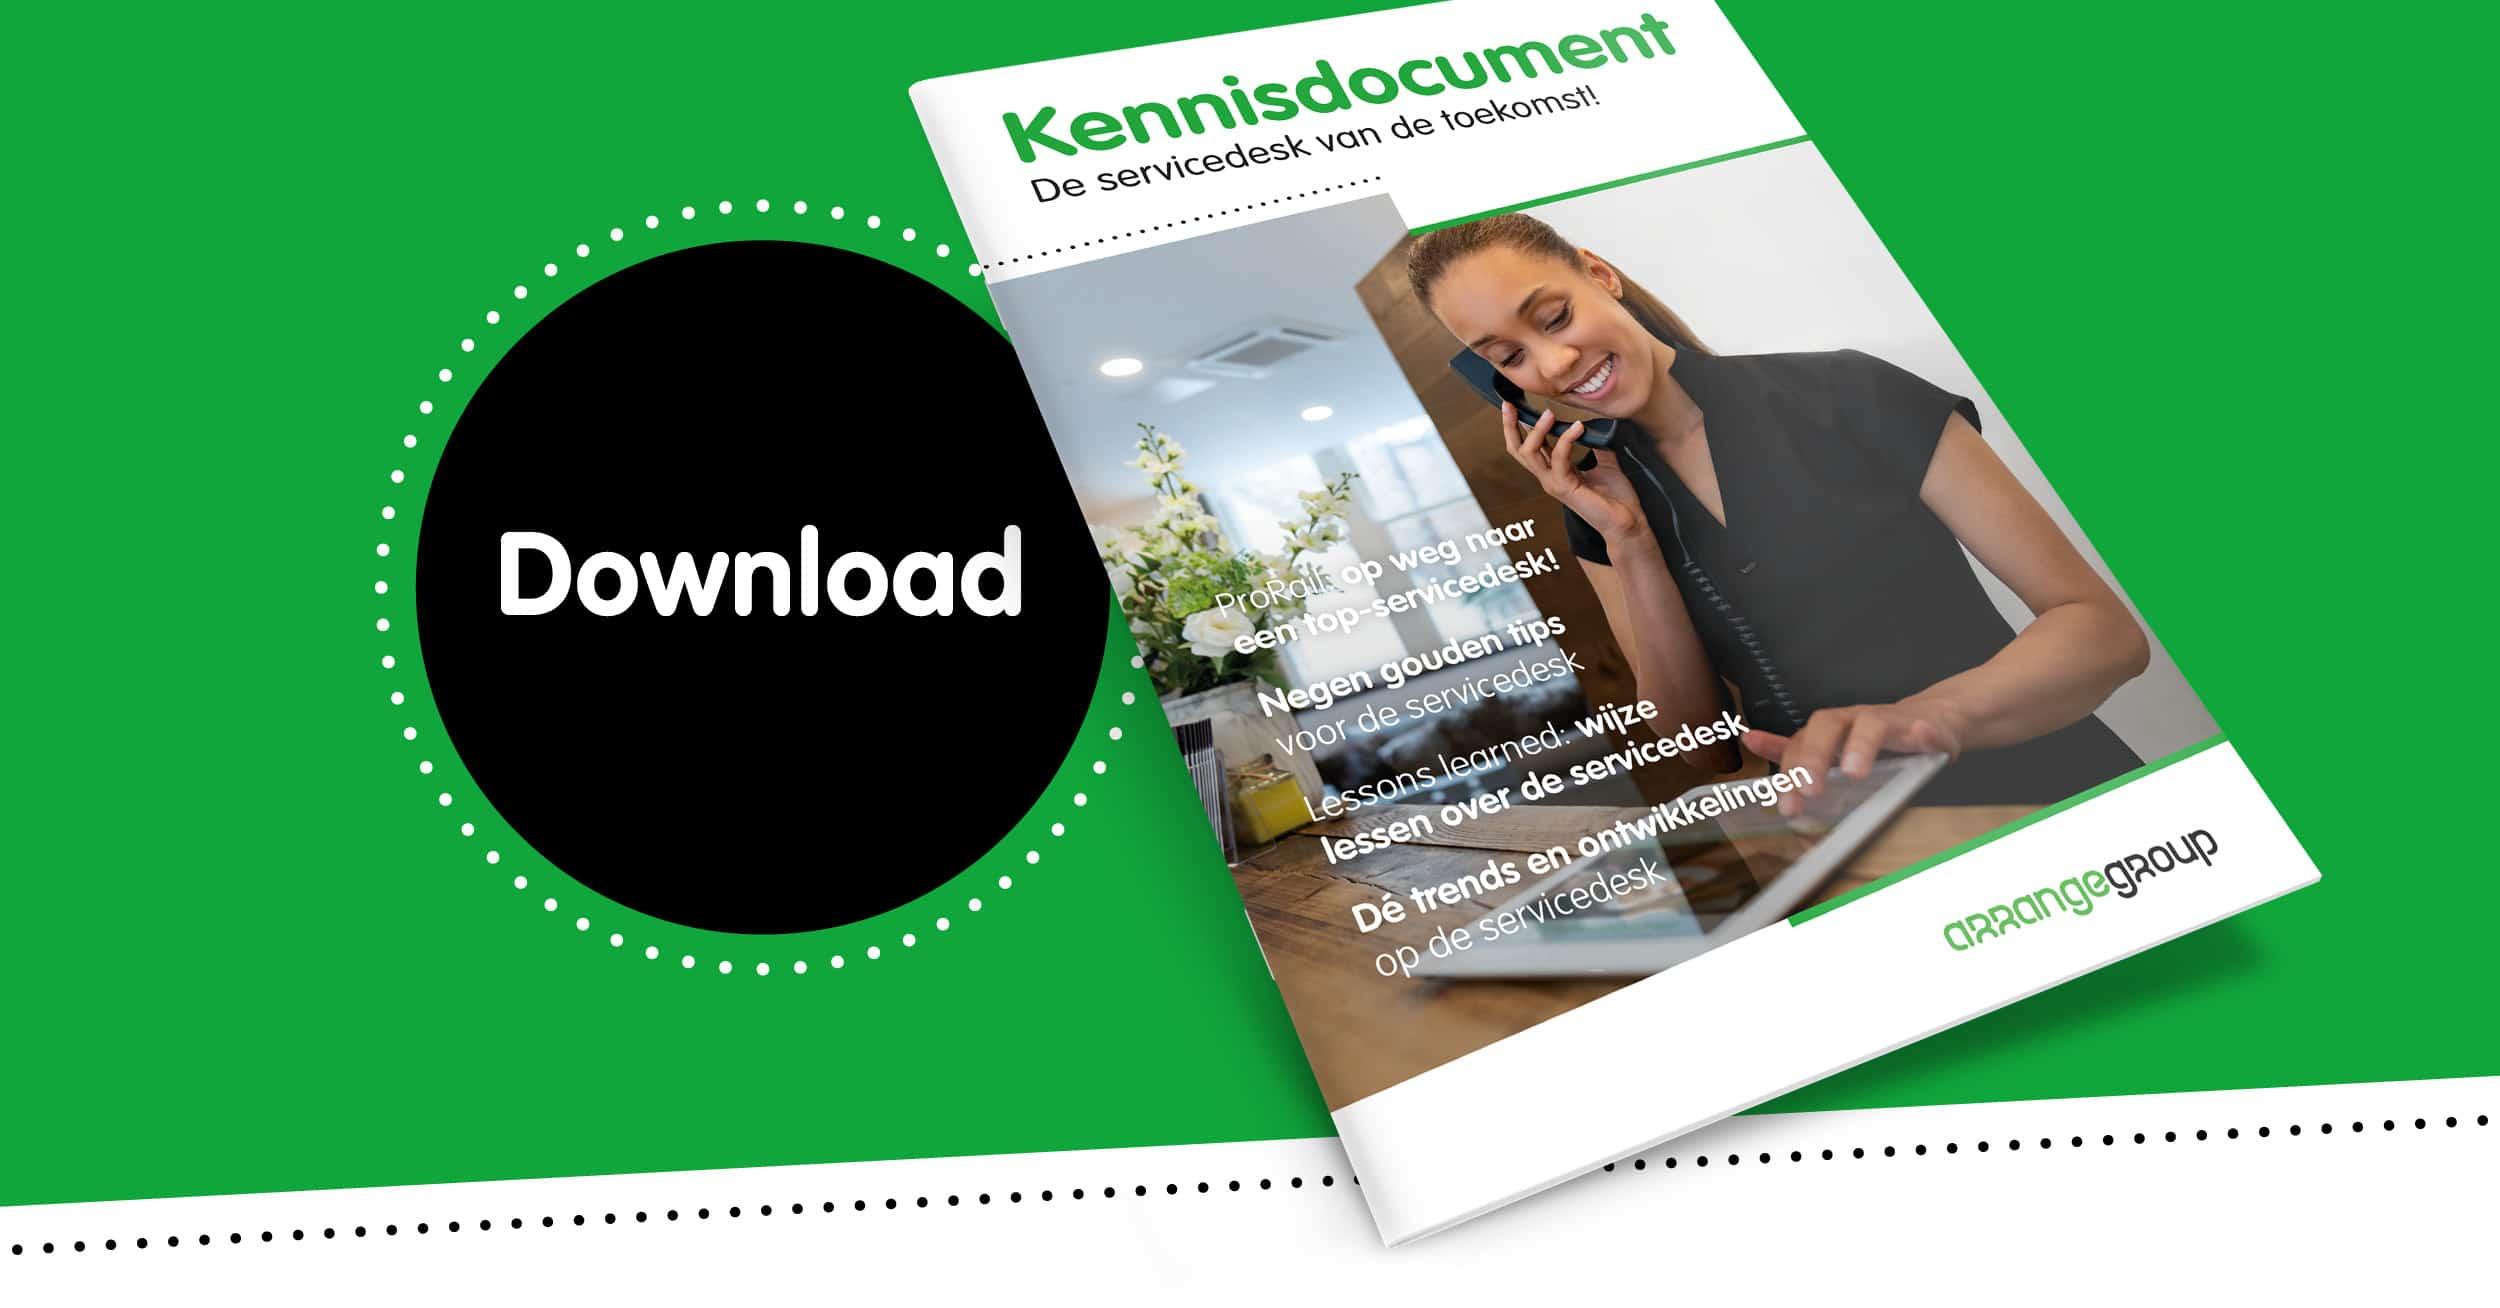 Kennisdocument Servicedesk